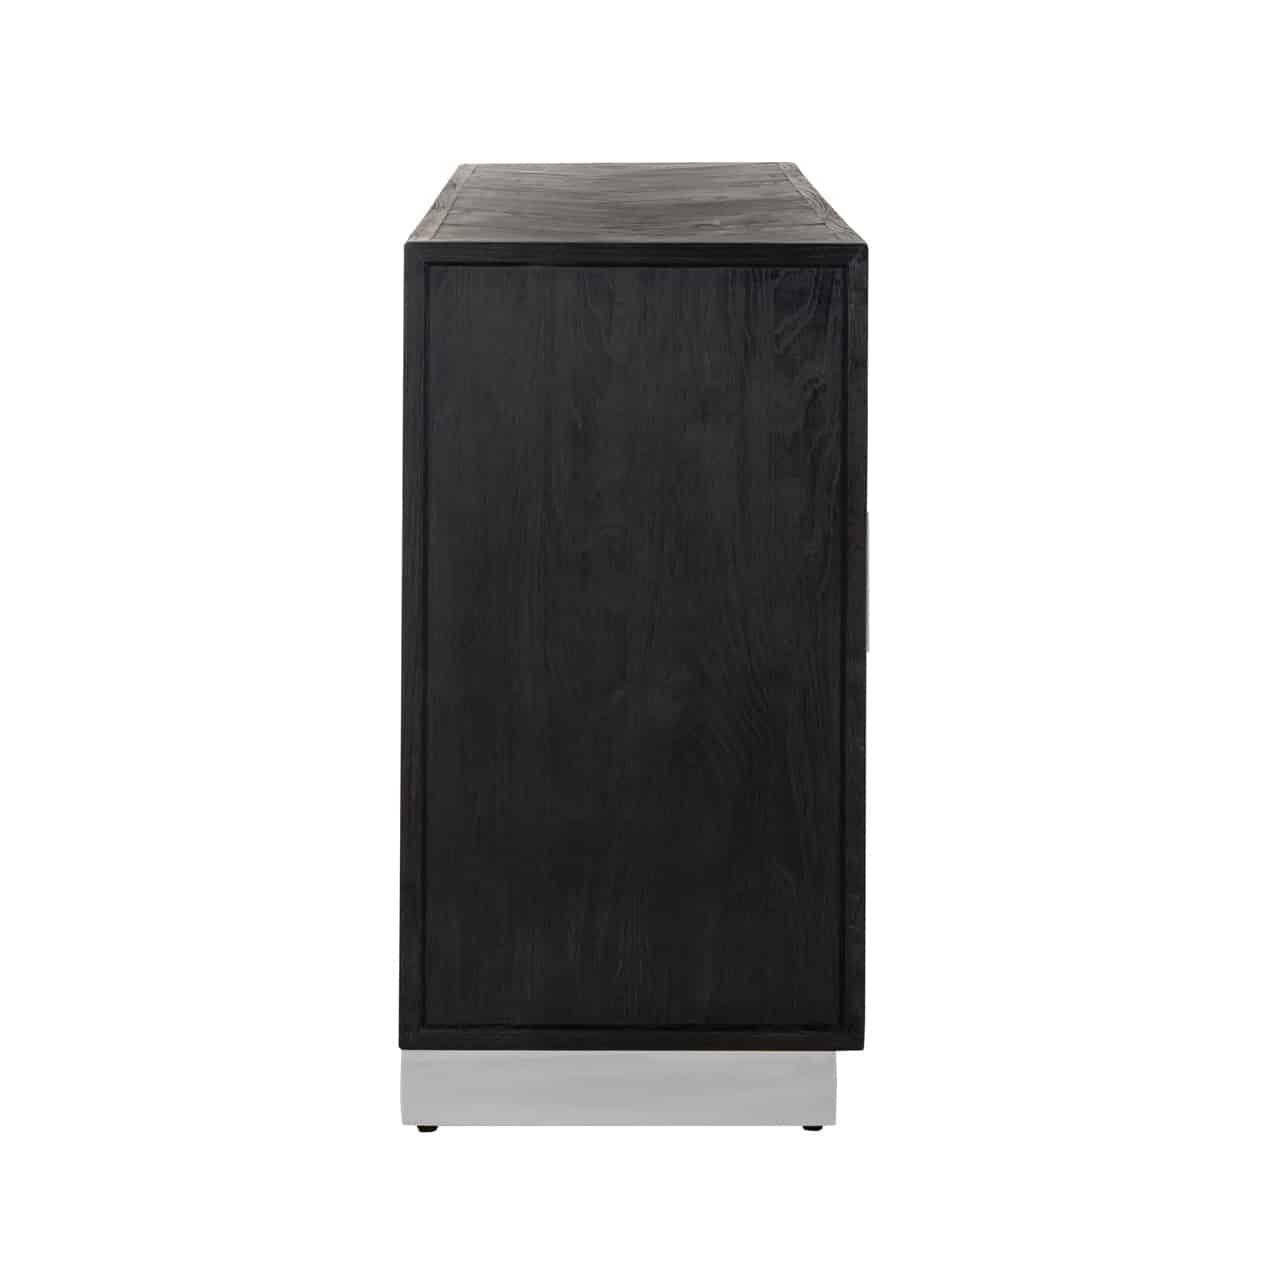 Dressoir Blackbone silver 4-deuren (Black)